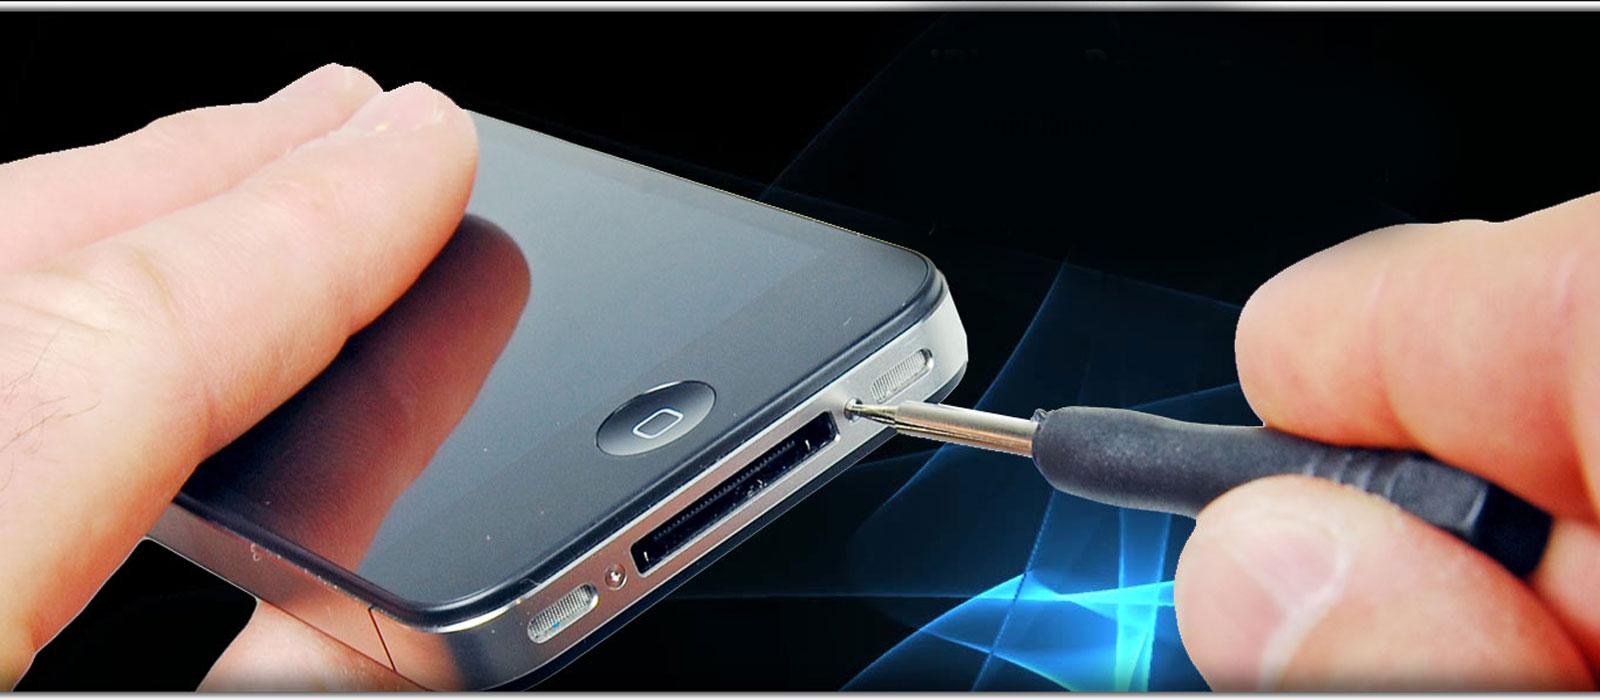 1483623652-mobile-repairing-institute.jpg